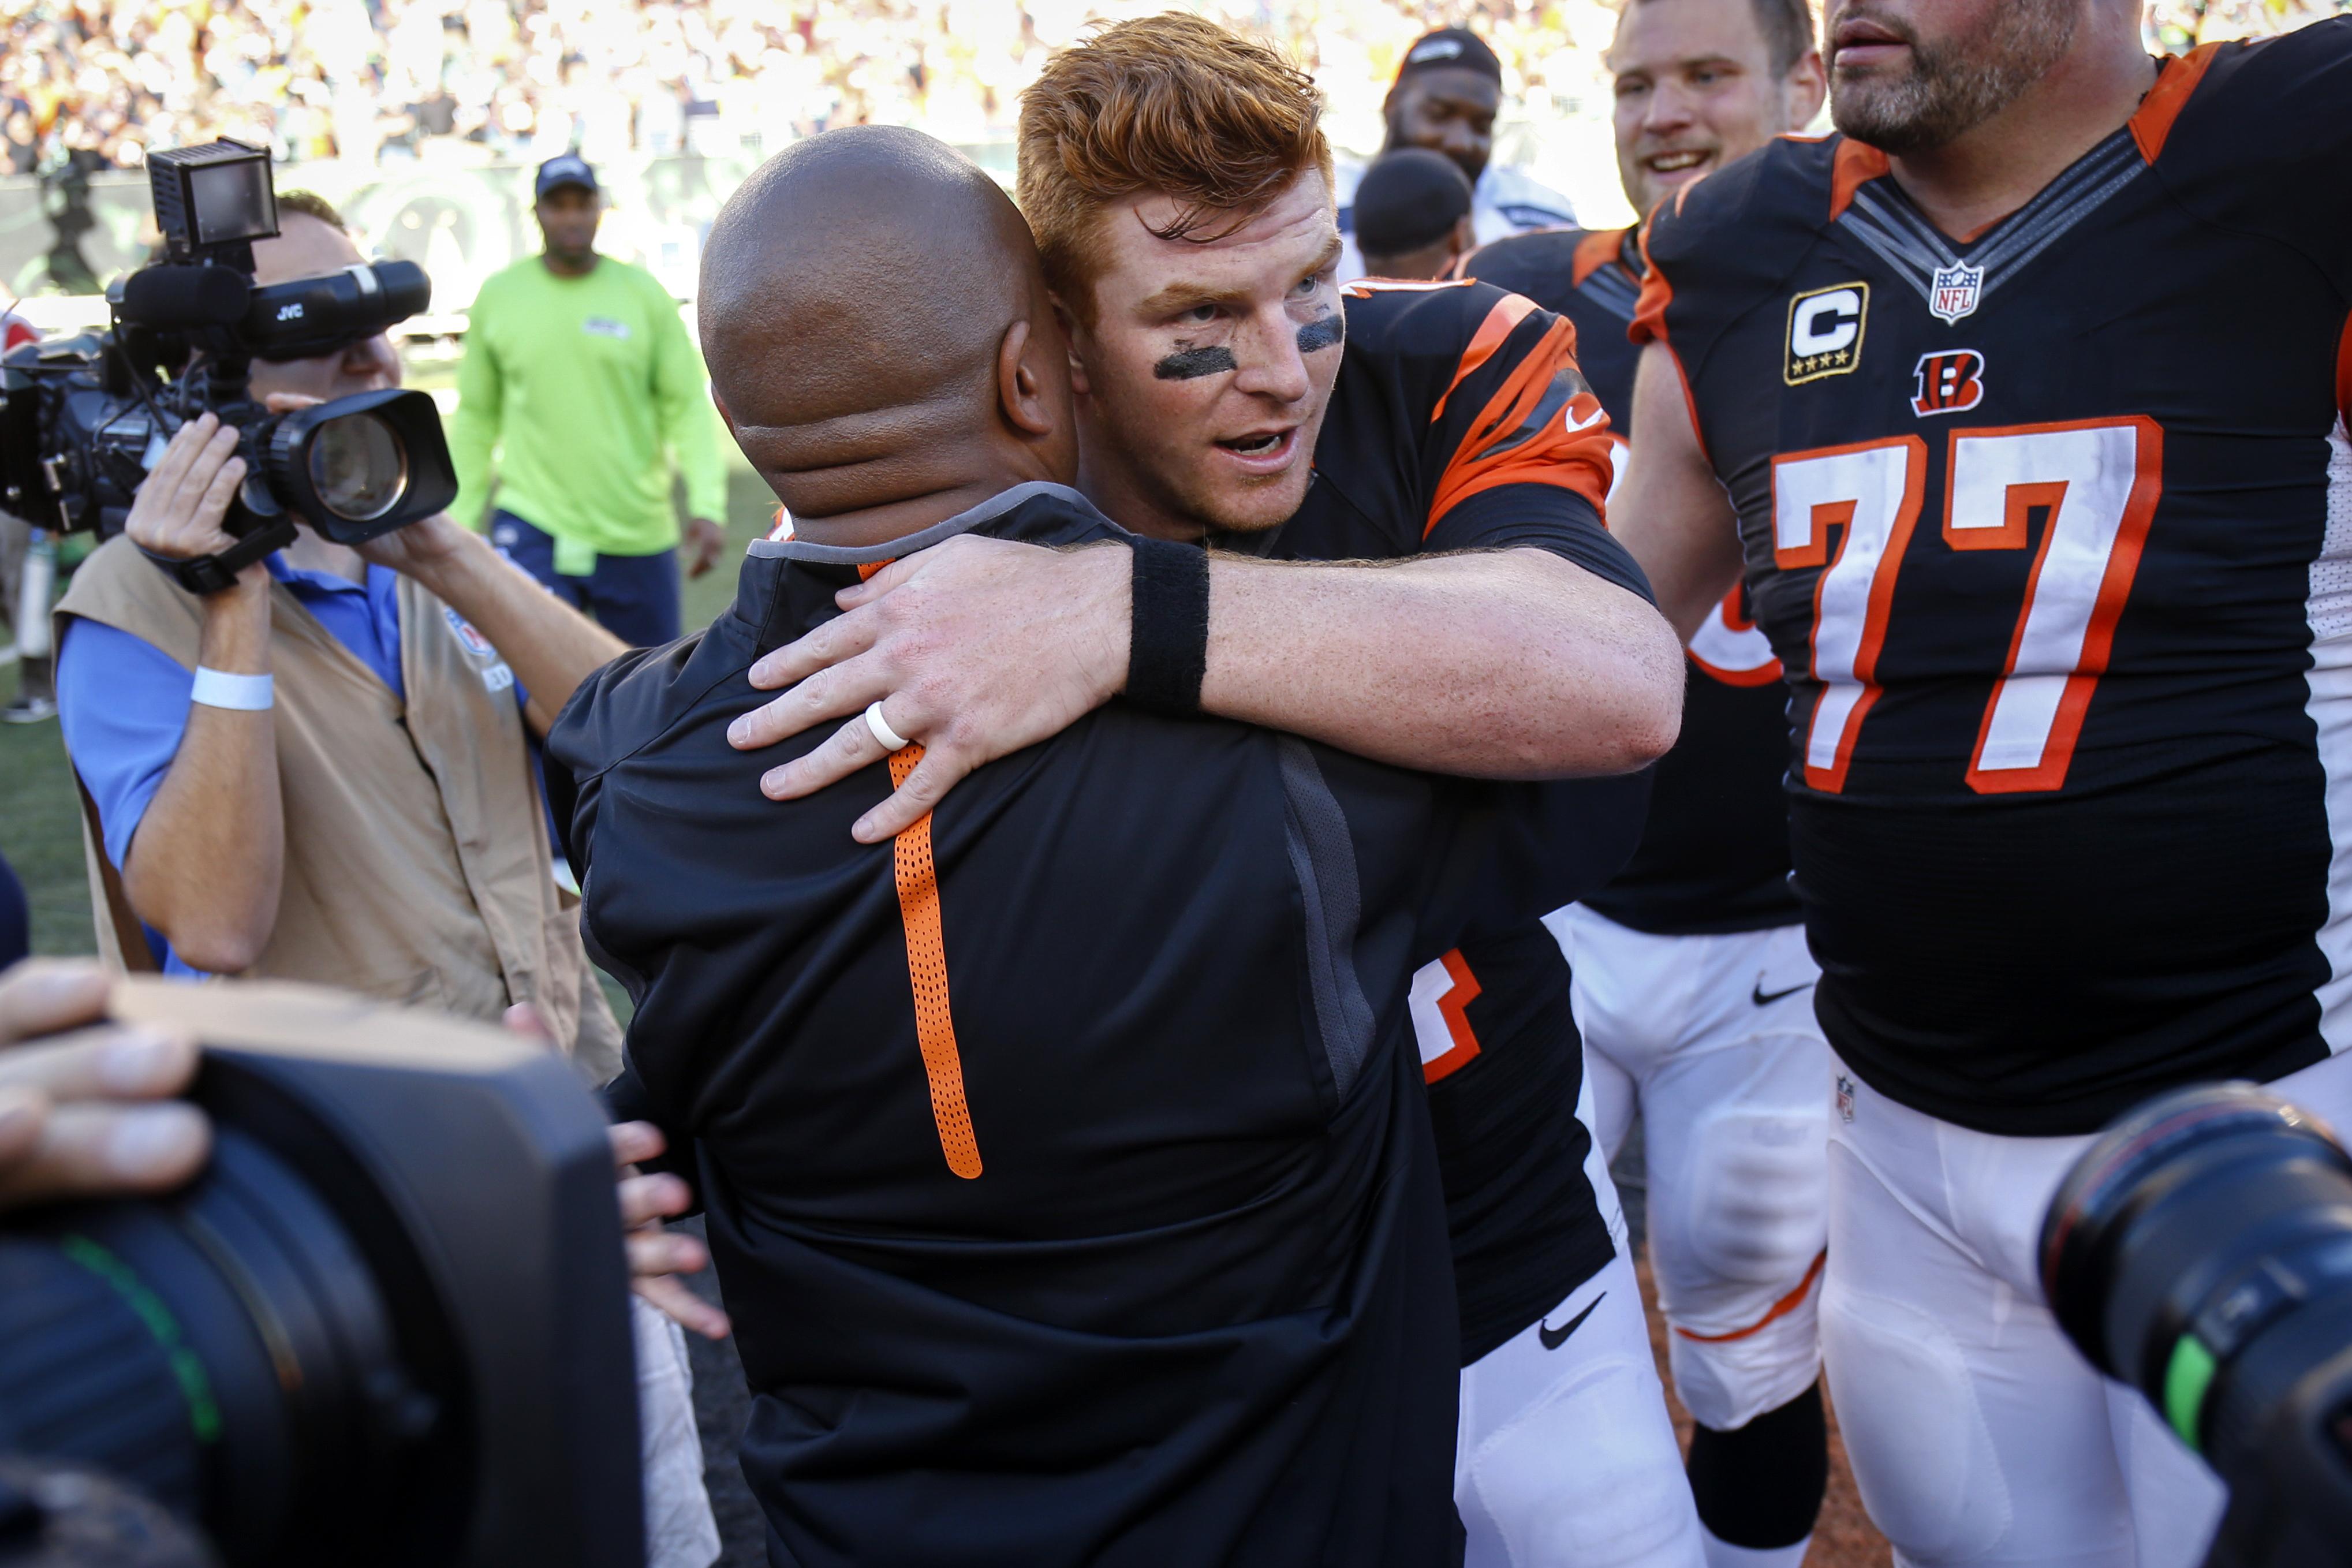 Cincinnati Bengals quarterback Andy Dalton, center right, hugs offensive coordinator Hue Jackson after an NFL football game against the Seattle Seahawks, Sunday, Oct. 11, 2015, in Cincinnati. The Bengals won 27-24. (AP Photo/Gary Landers)